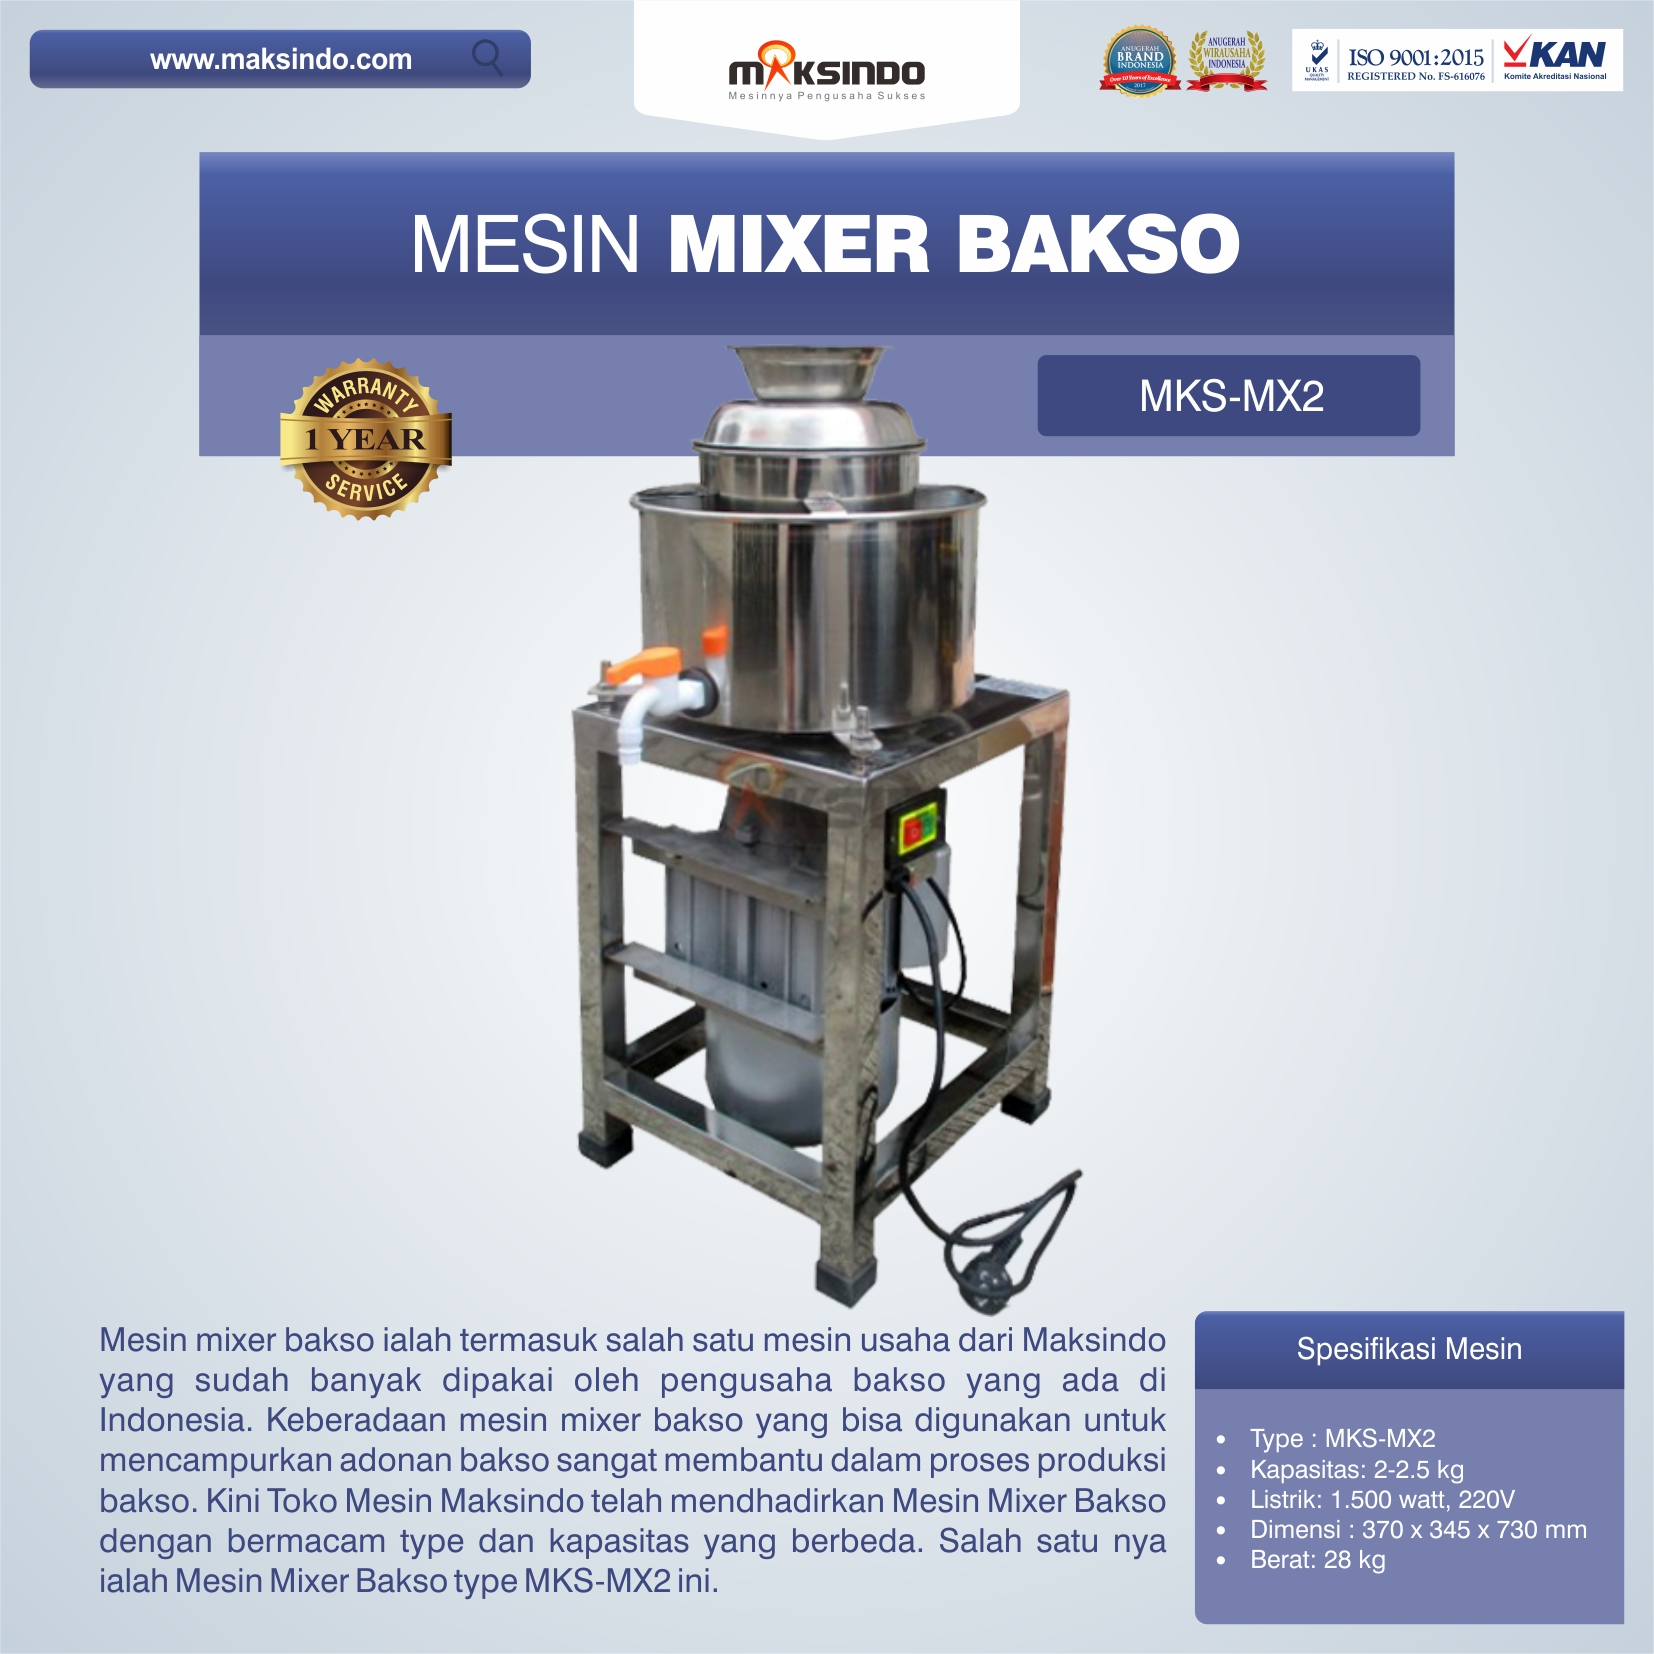 Jual Mesin Mixer Bakso MKS-MX2 di Bekasi